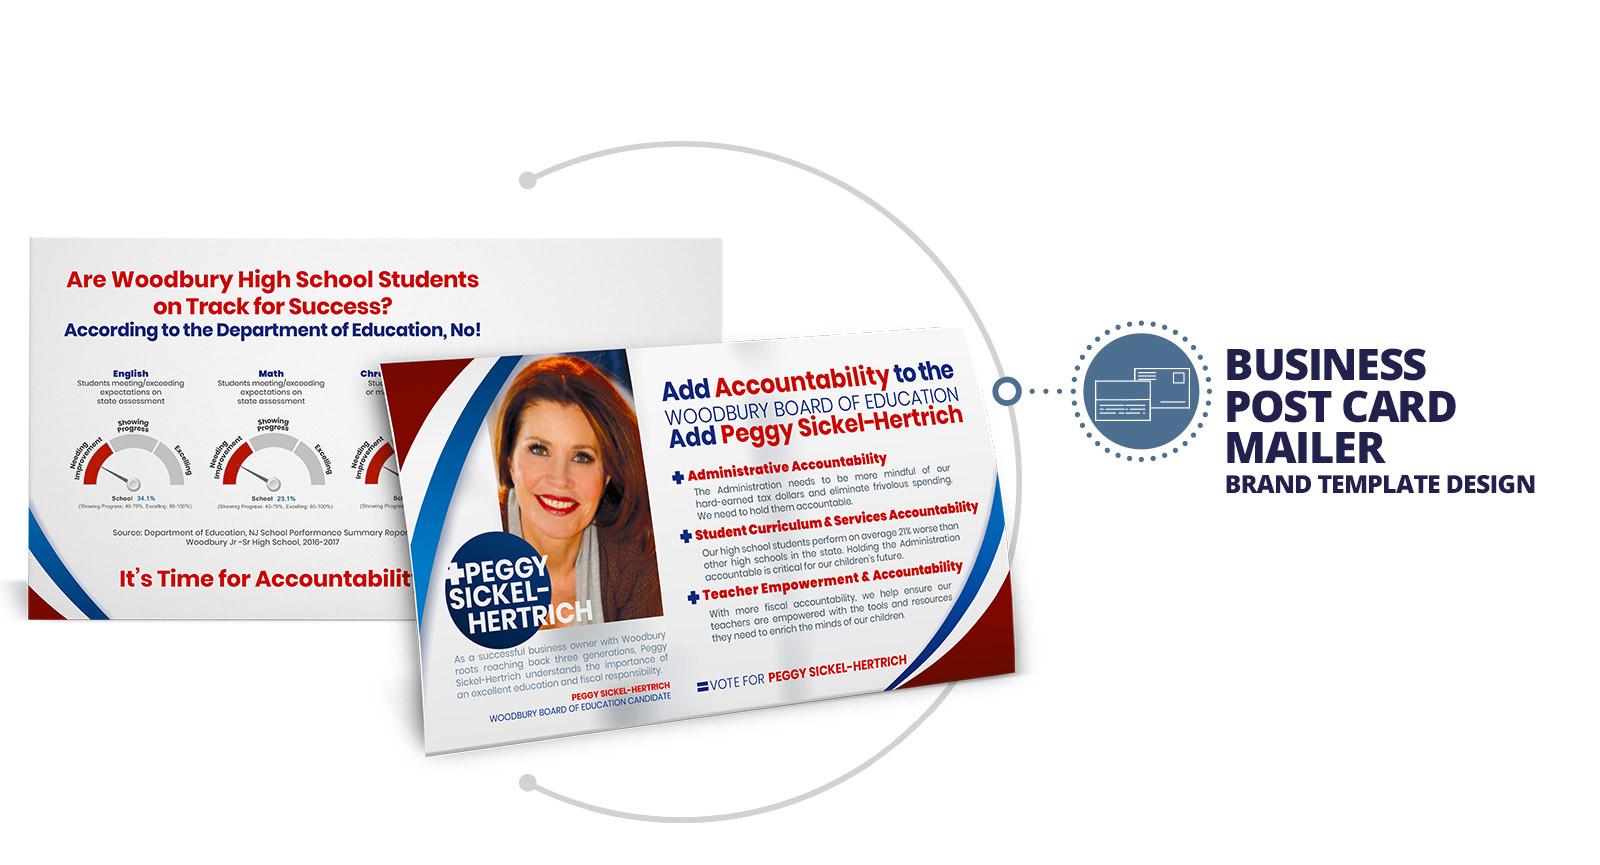 Marketing Agency | Custom Post Card Mailer Template Design